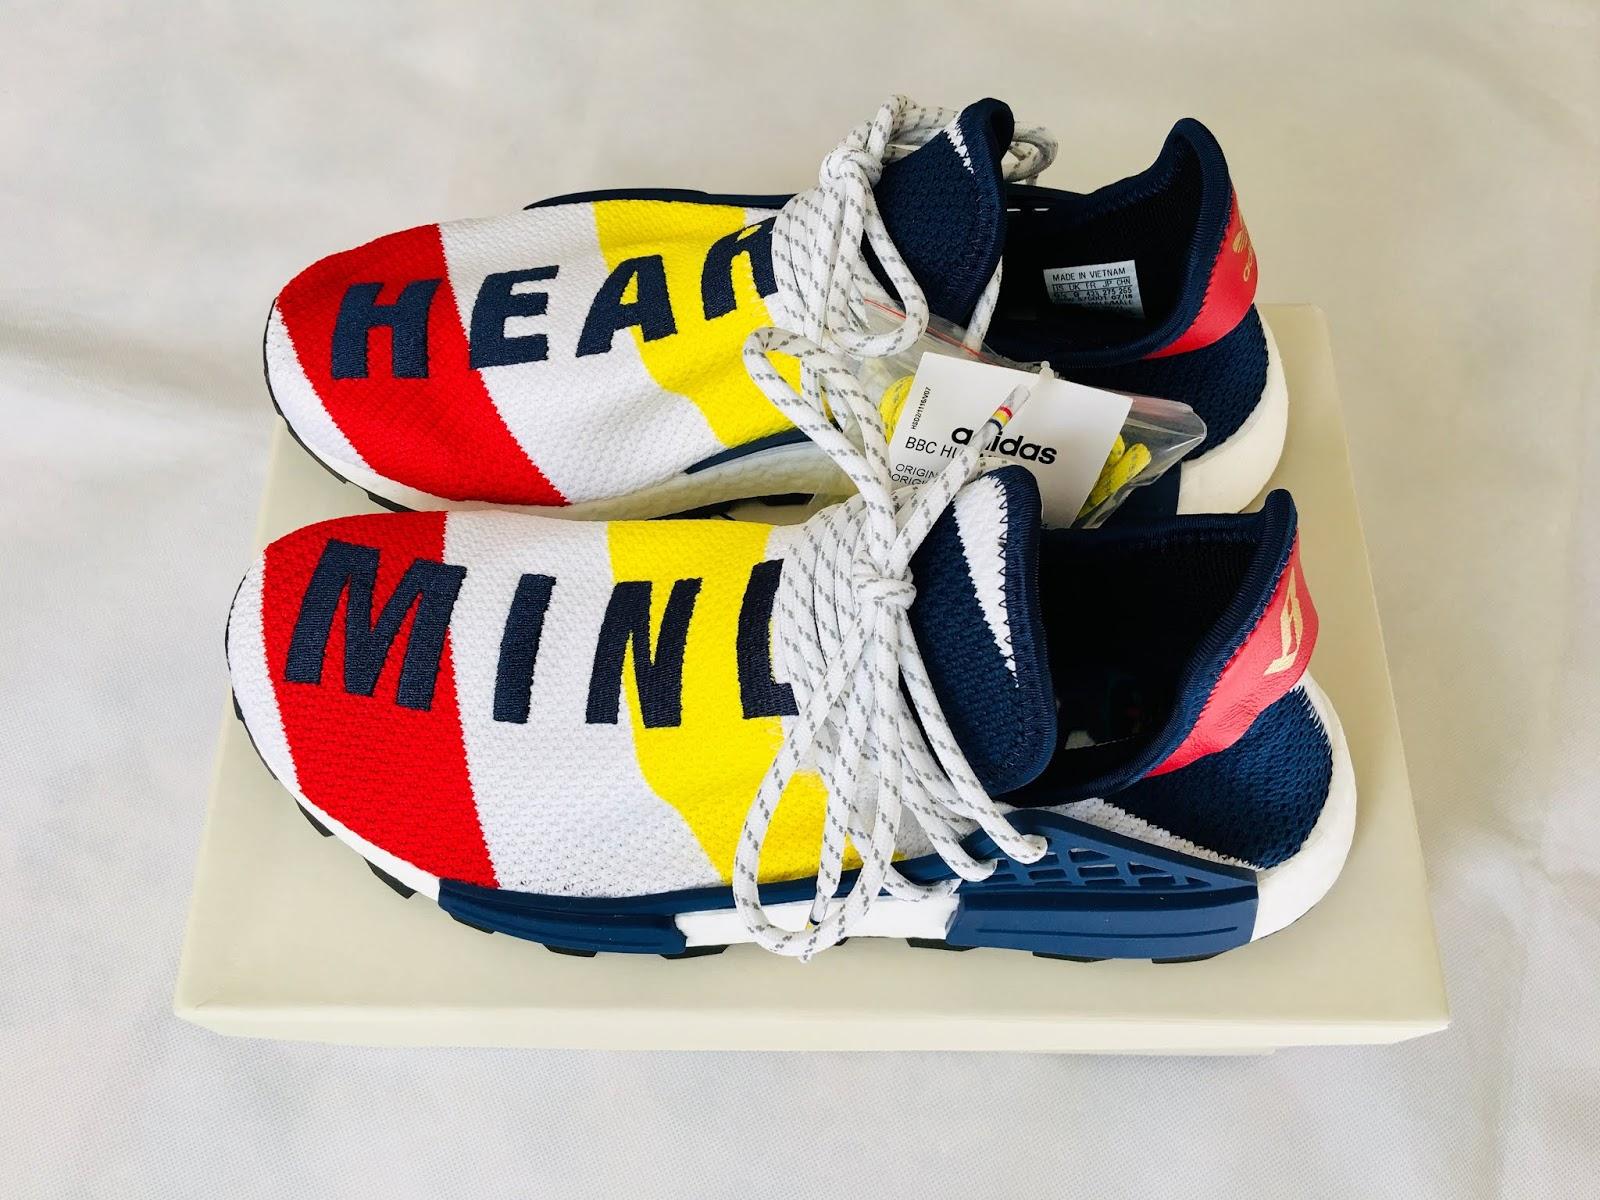 947dbf90a9377 Adidas x Pharrell Williams x Billionaire Boys Club HU NMD Sneakers BB9544